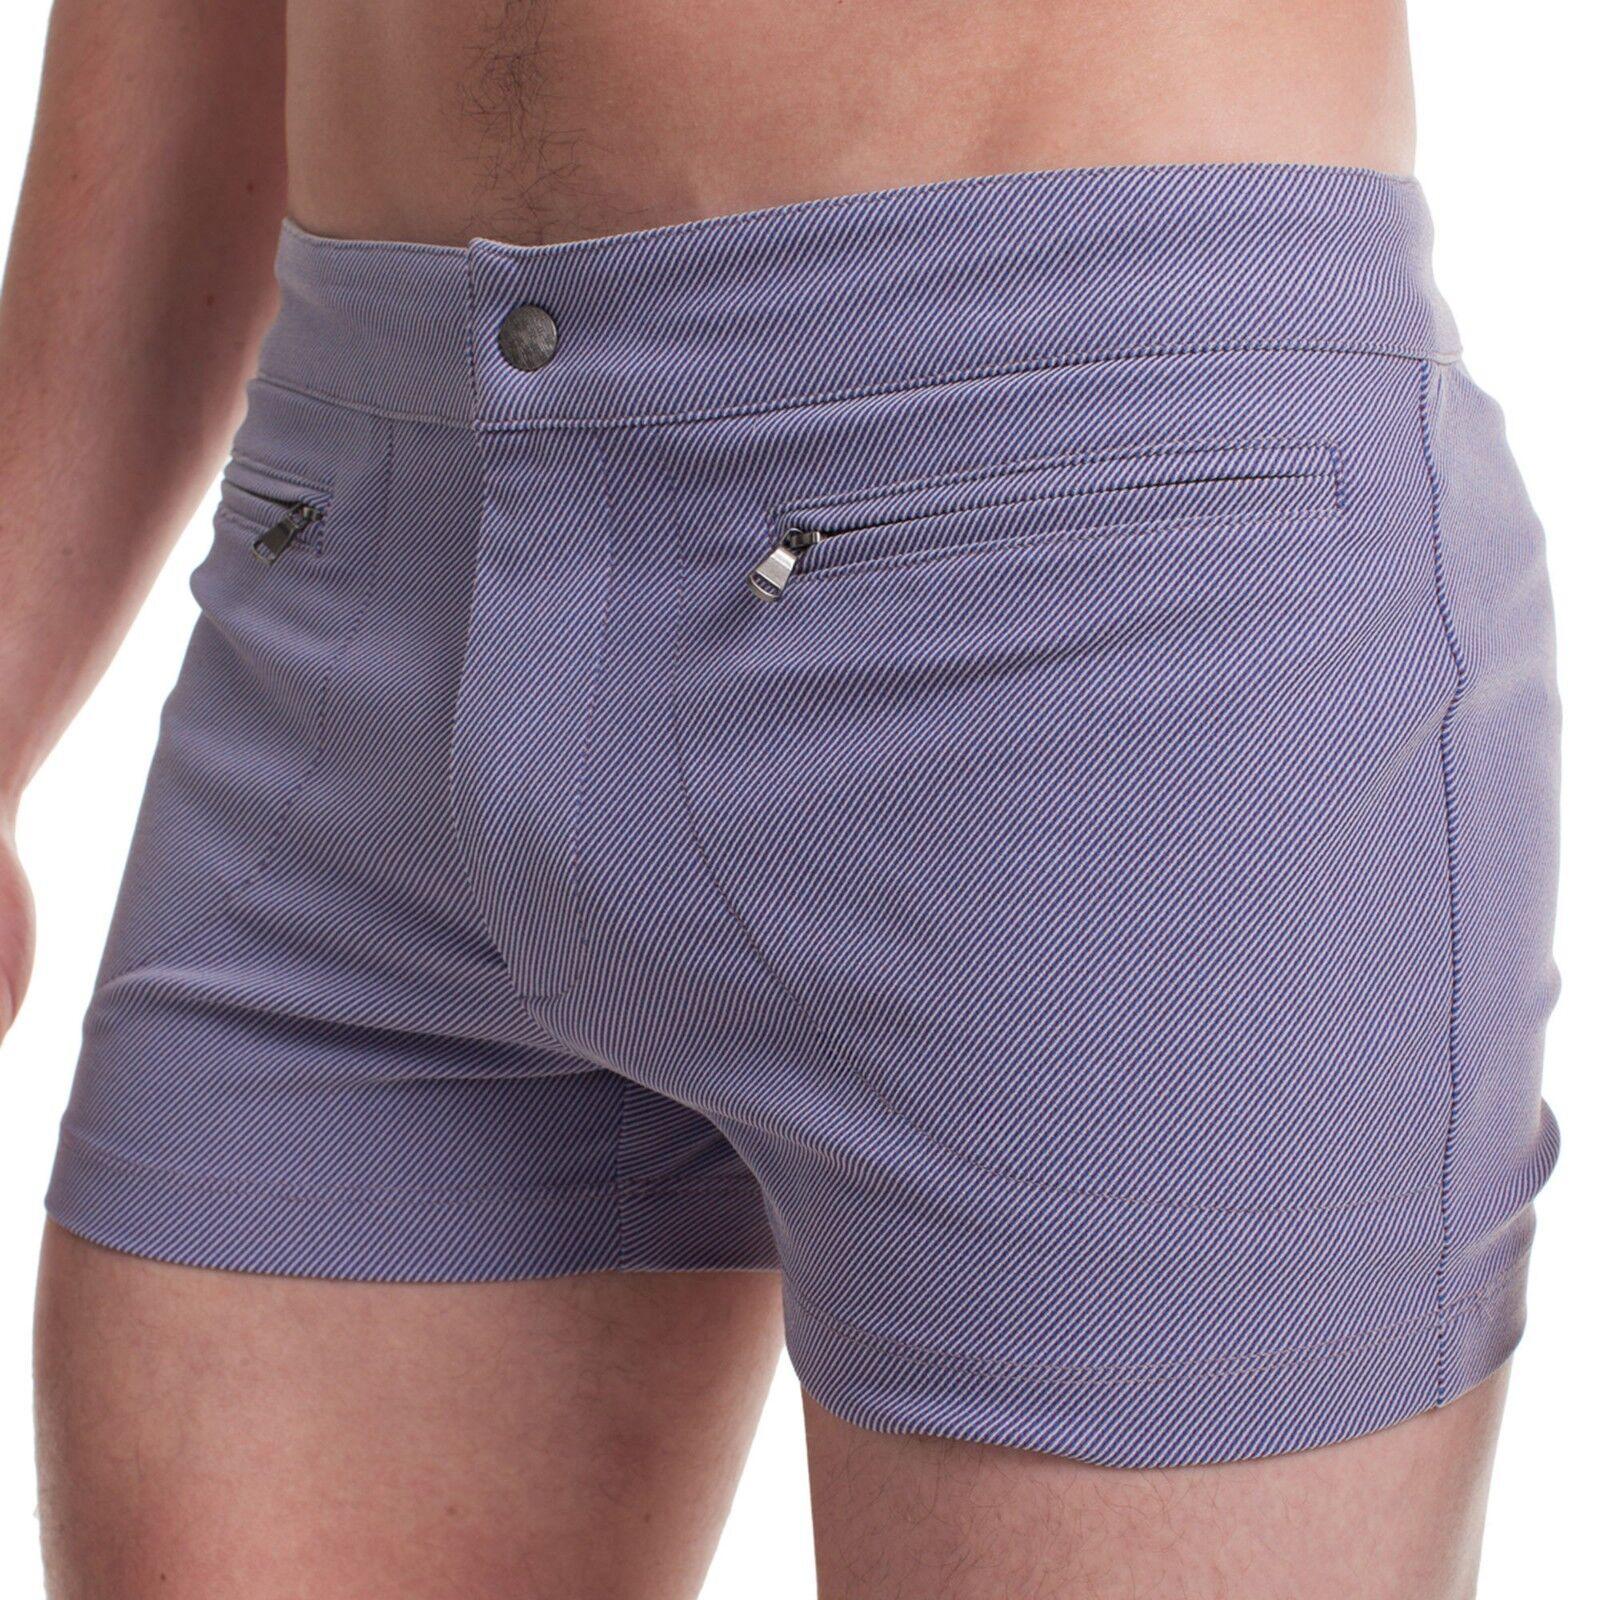 MR TURK 'Jones Bch Criss Cross Jacquard' Men's Swim Bathing Trunks Shorts 31 NWT